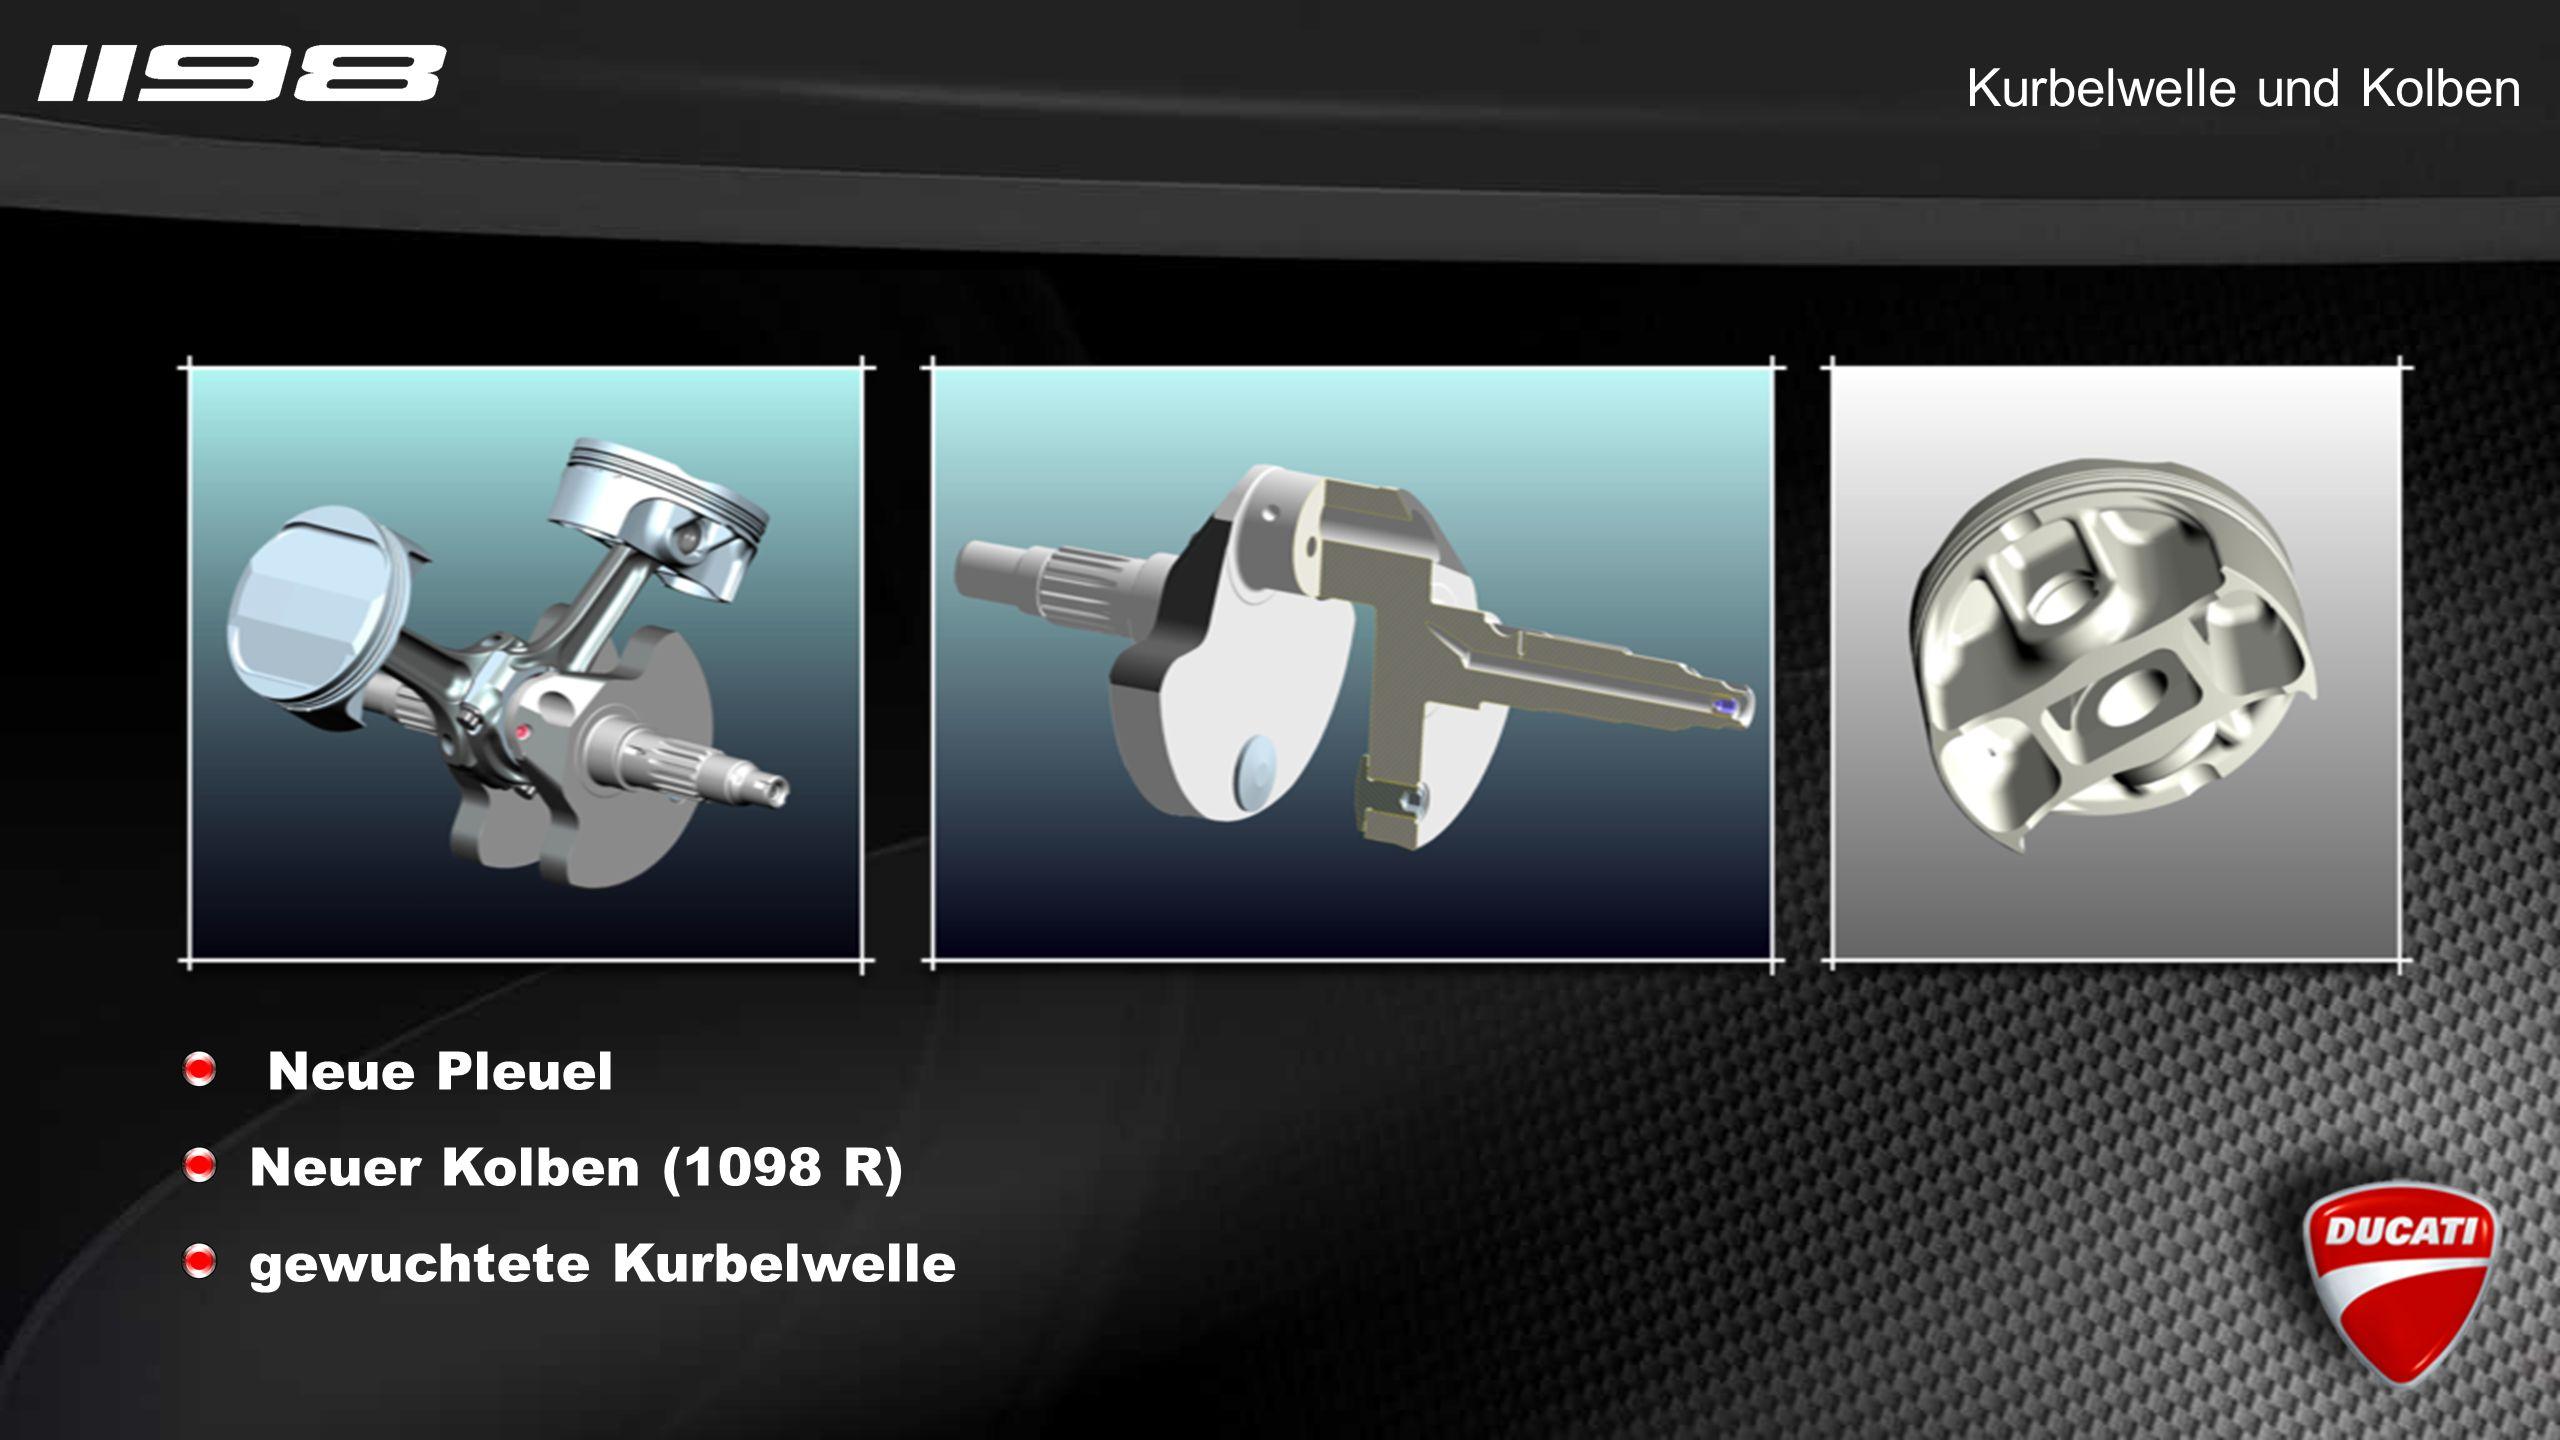 Kurbelwelle und Kolben Neue Pleuel Neuer Kolben (1098 R) gewuchtete Kurbelwelle